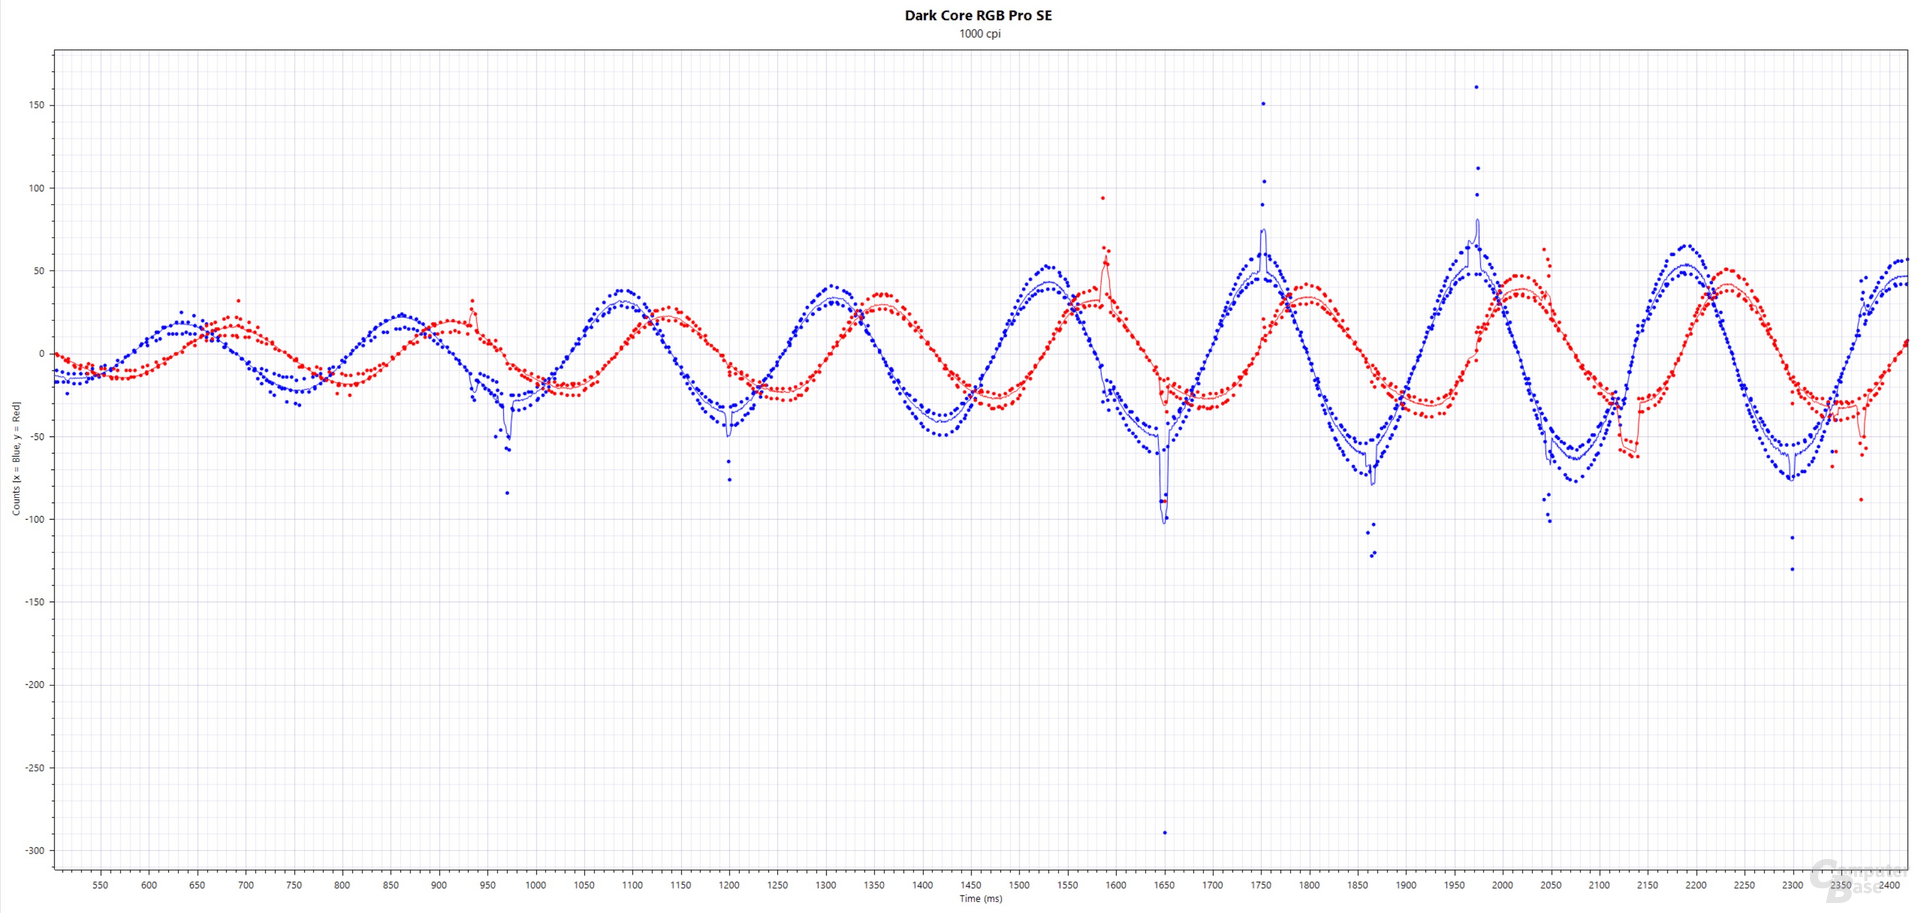 Blau: xCounts(ms), Rot: yCounts(ms); Corsair Dark Core RGB Pro SE (PixArt PAW-3392, 1.000 cpi, 1.000 Hertz, Stoffmauspad)